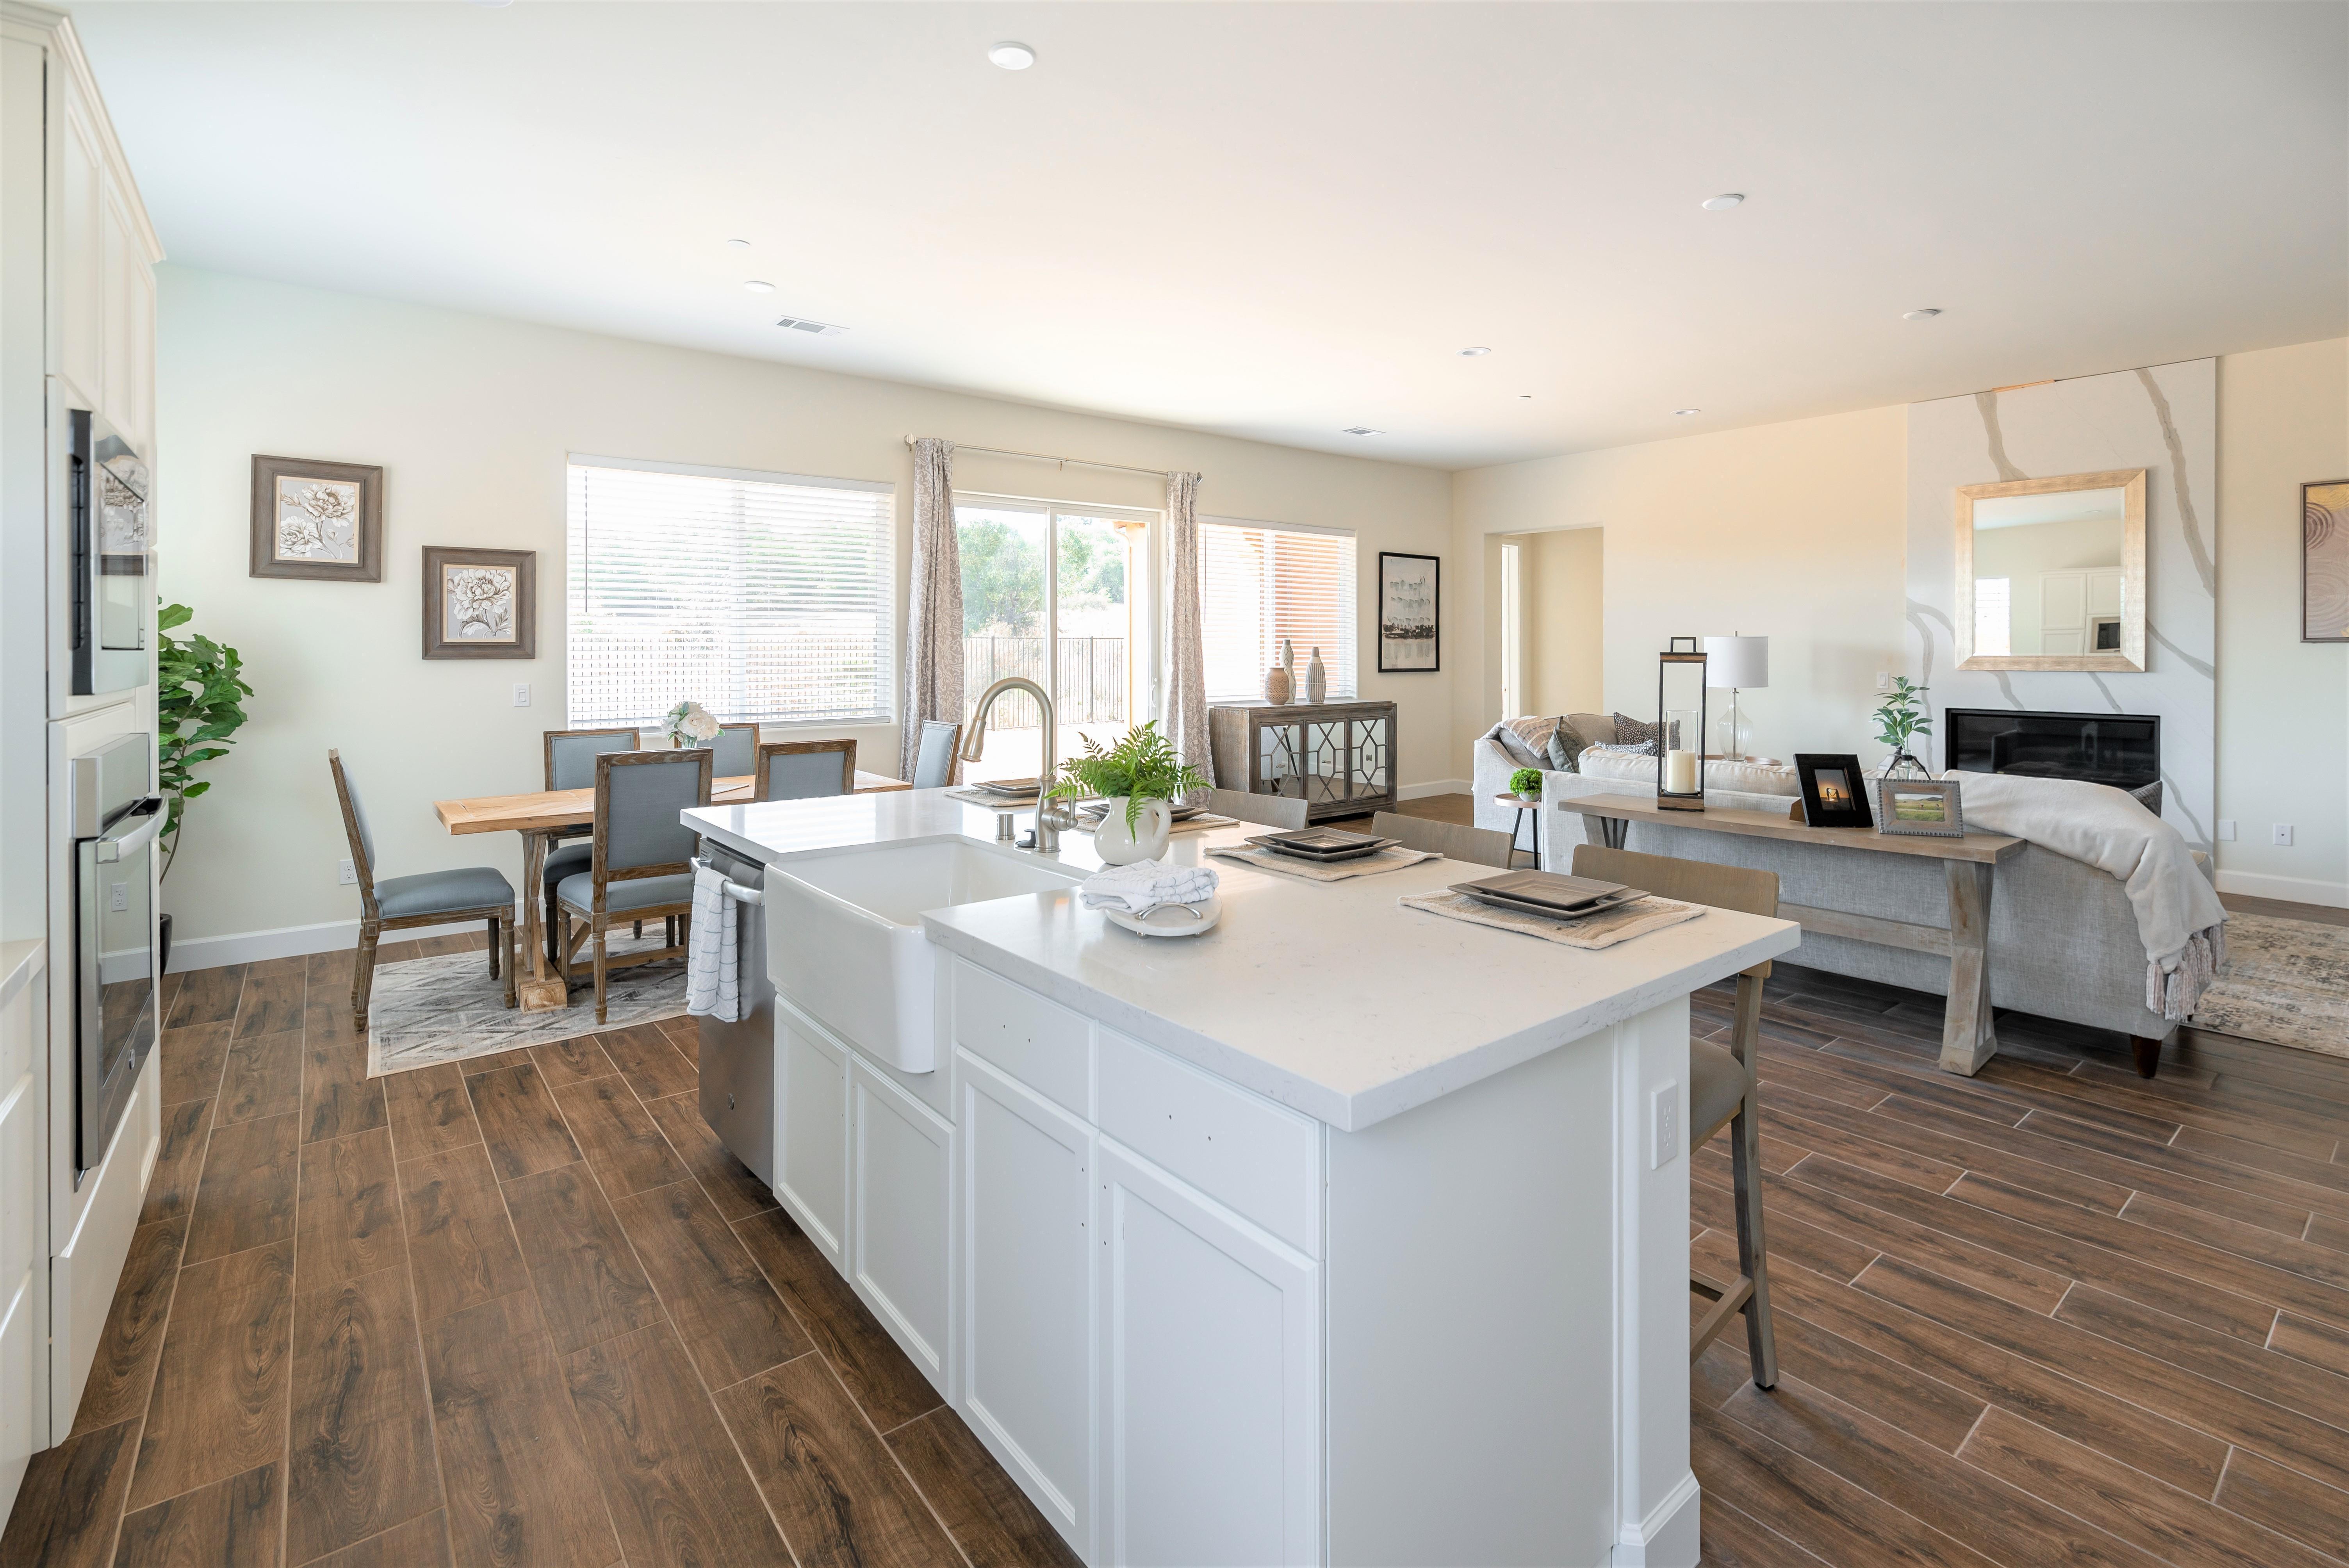 Living Area featured in the Cambridge By Coastal Community Builders in Santa Barbara, CA